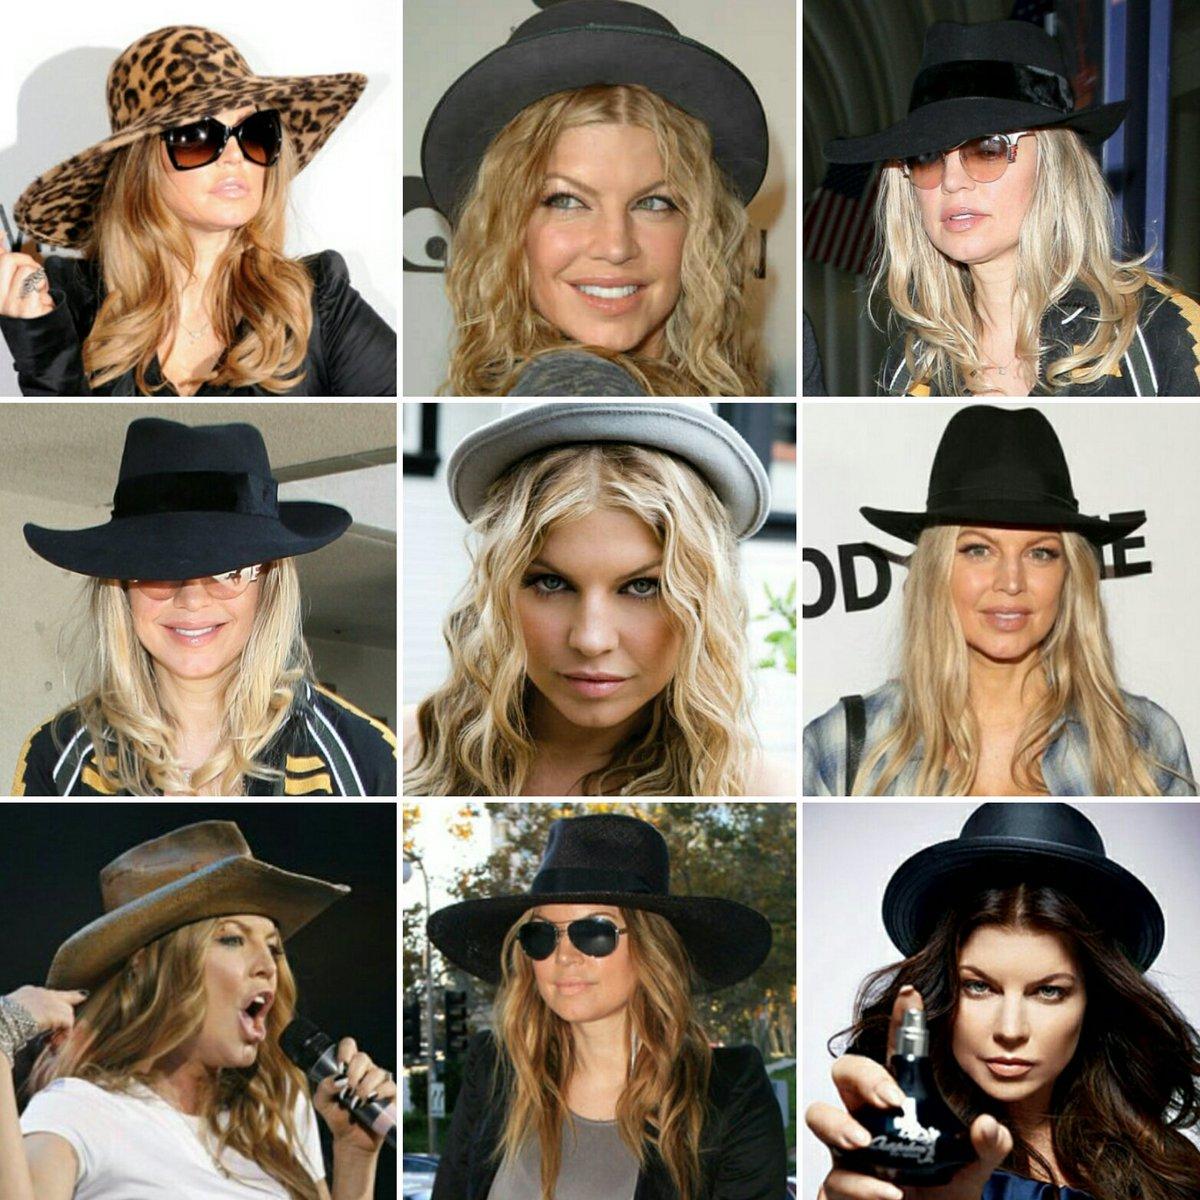 RT @Kornel73: #NationalHatDay  @Fergie love her hats! ???? We love #Fergie! ???? https://t.co/6hnSsxXHe5